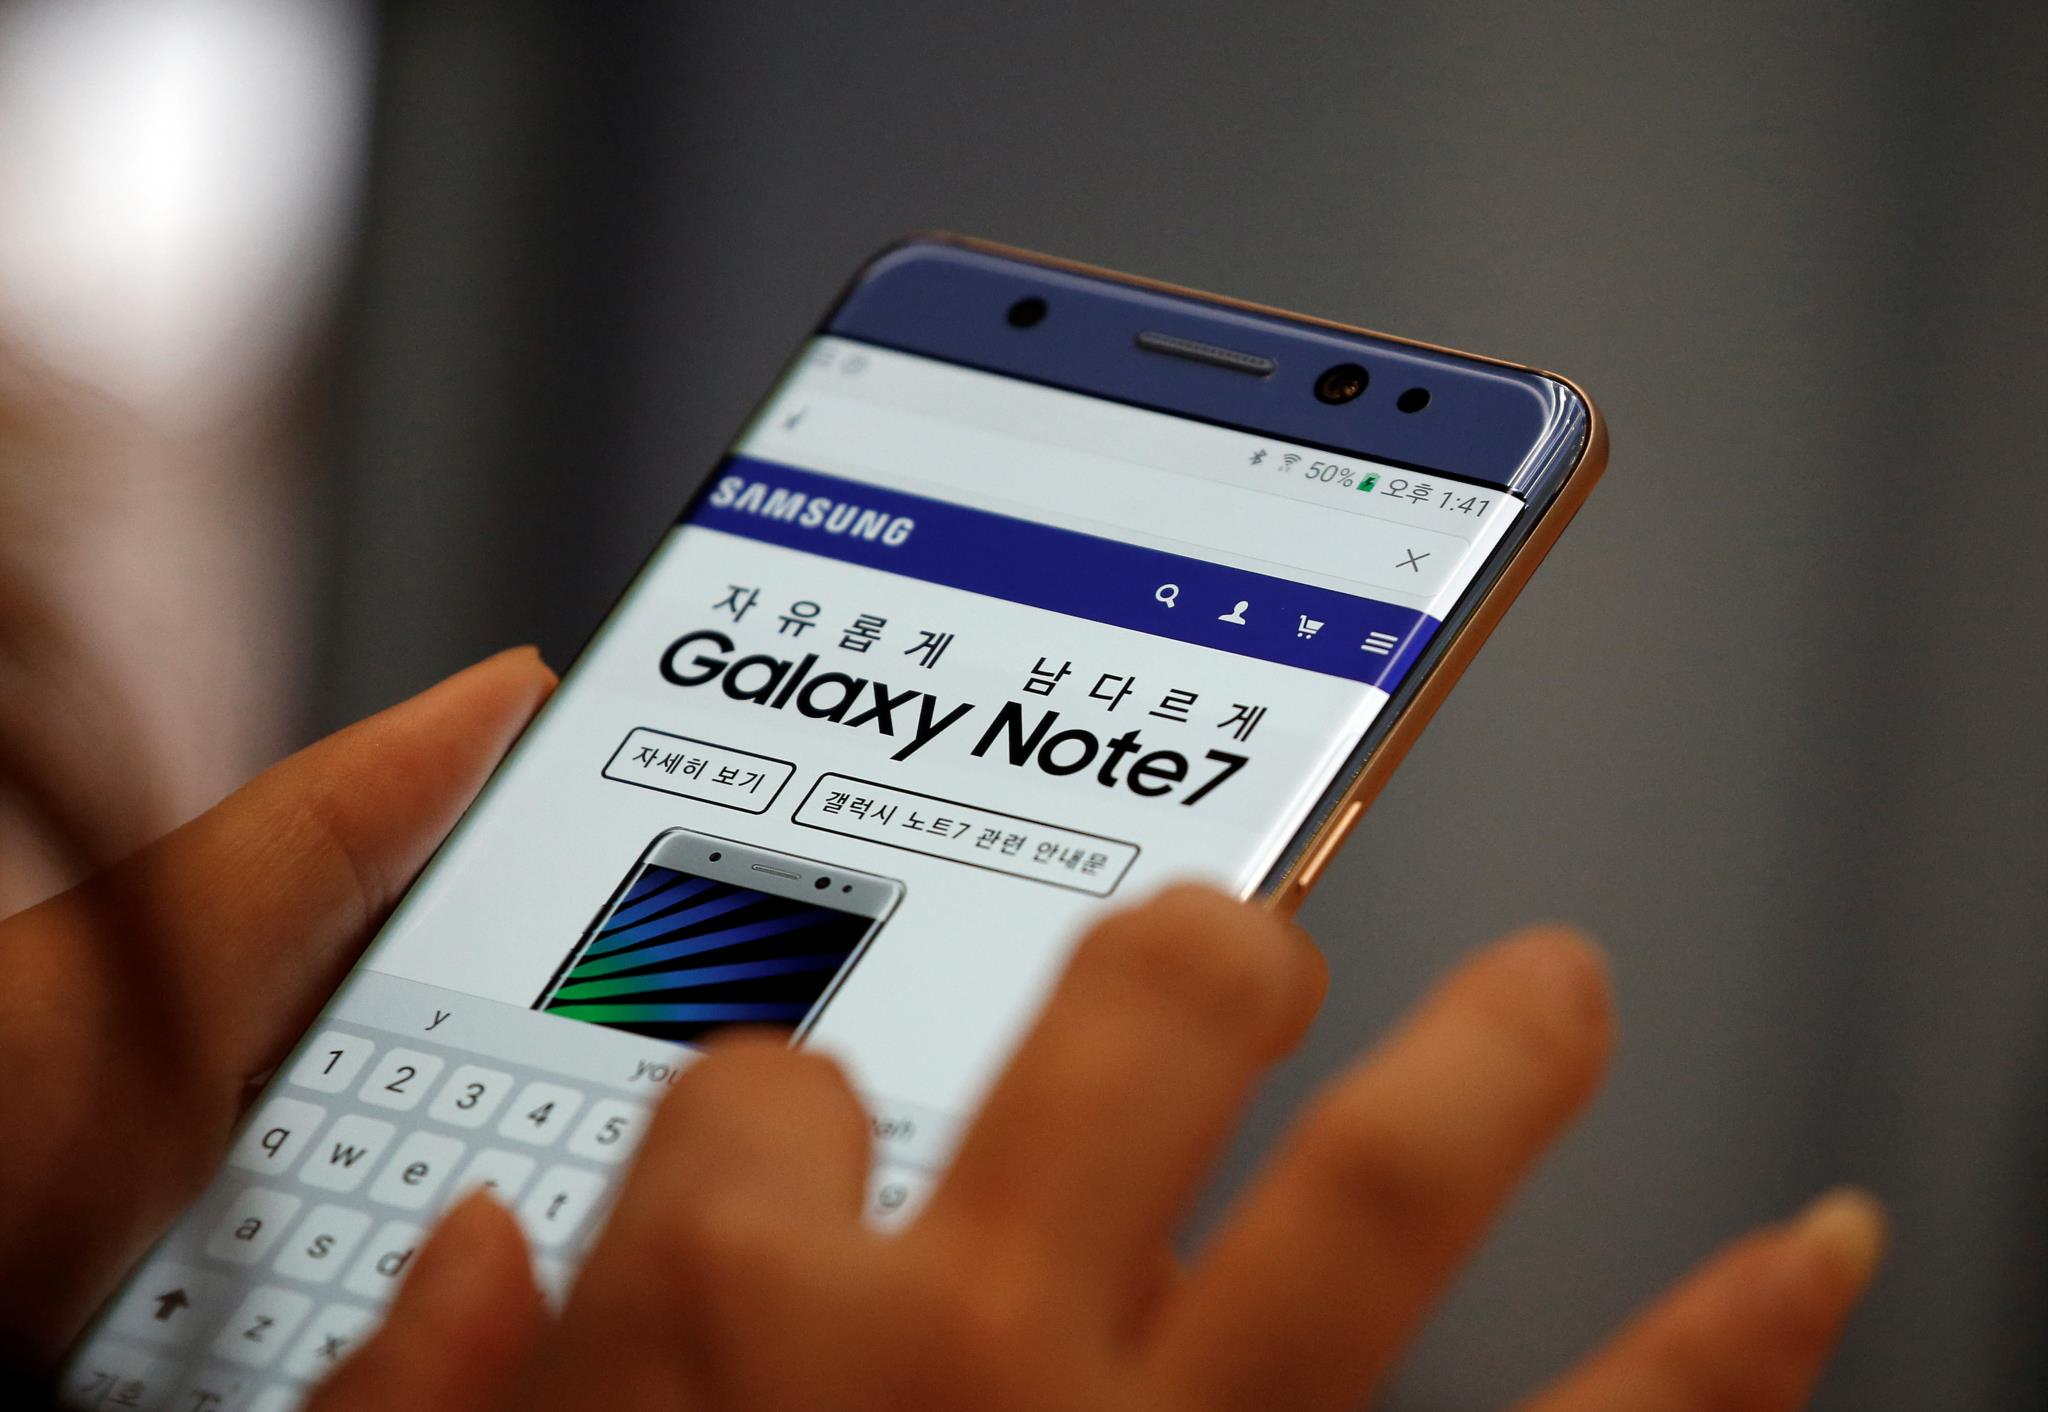 PÚBLICO - Samsung vai recuperar alguns Note 7 para os voltar a pôr no mercado